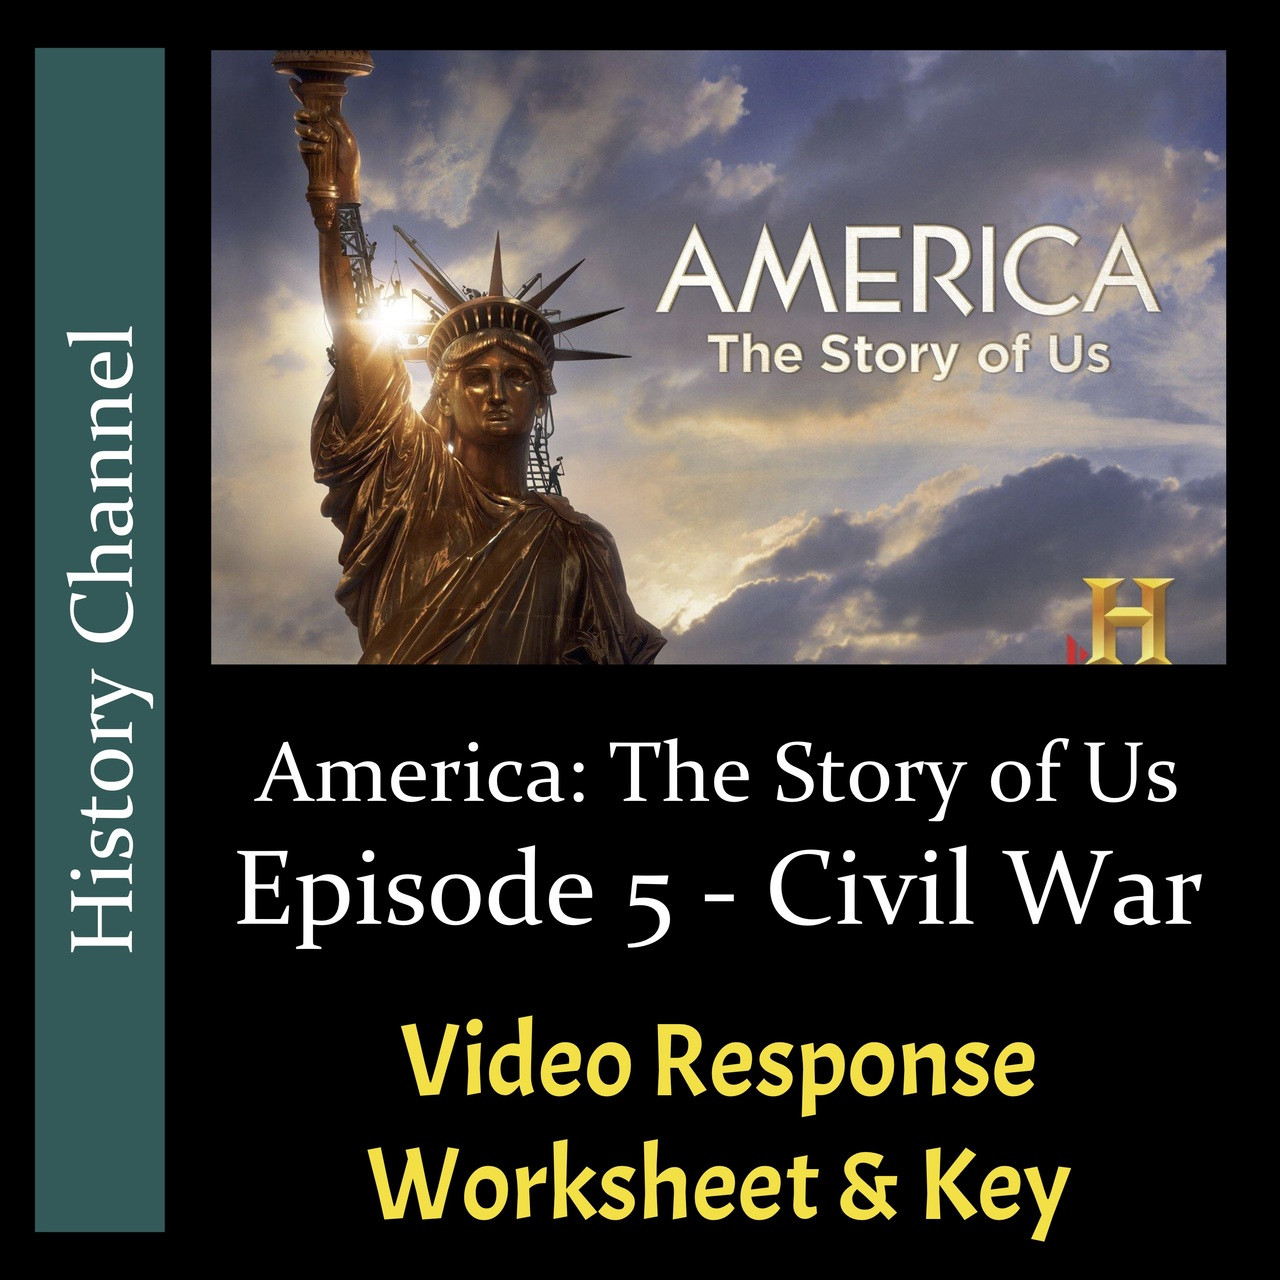 America The Story of Us - Episode 05: Civil War - Video Response Worksheet  \u0026 Key (Editable) - Amped Up Learning [ 1280 x 1280 Pixel ]